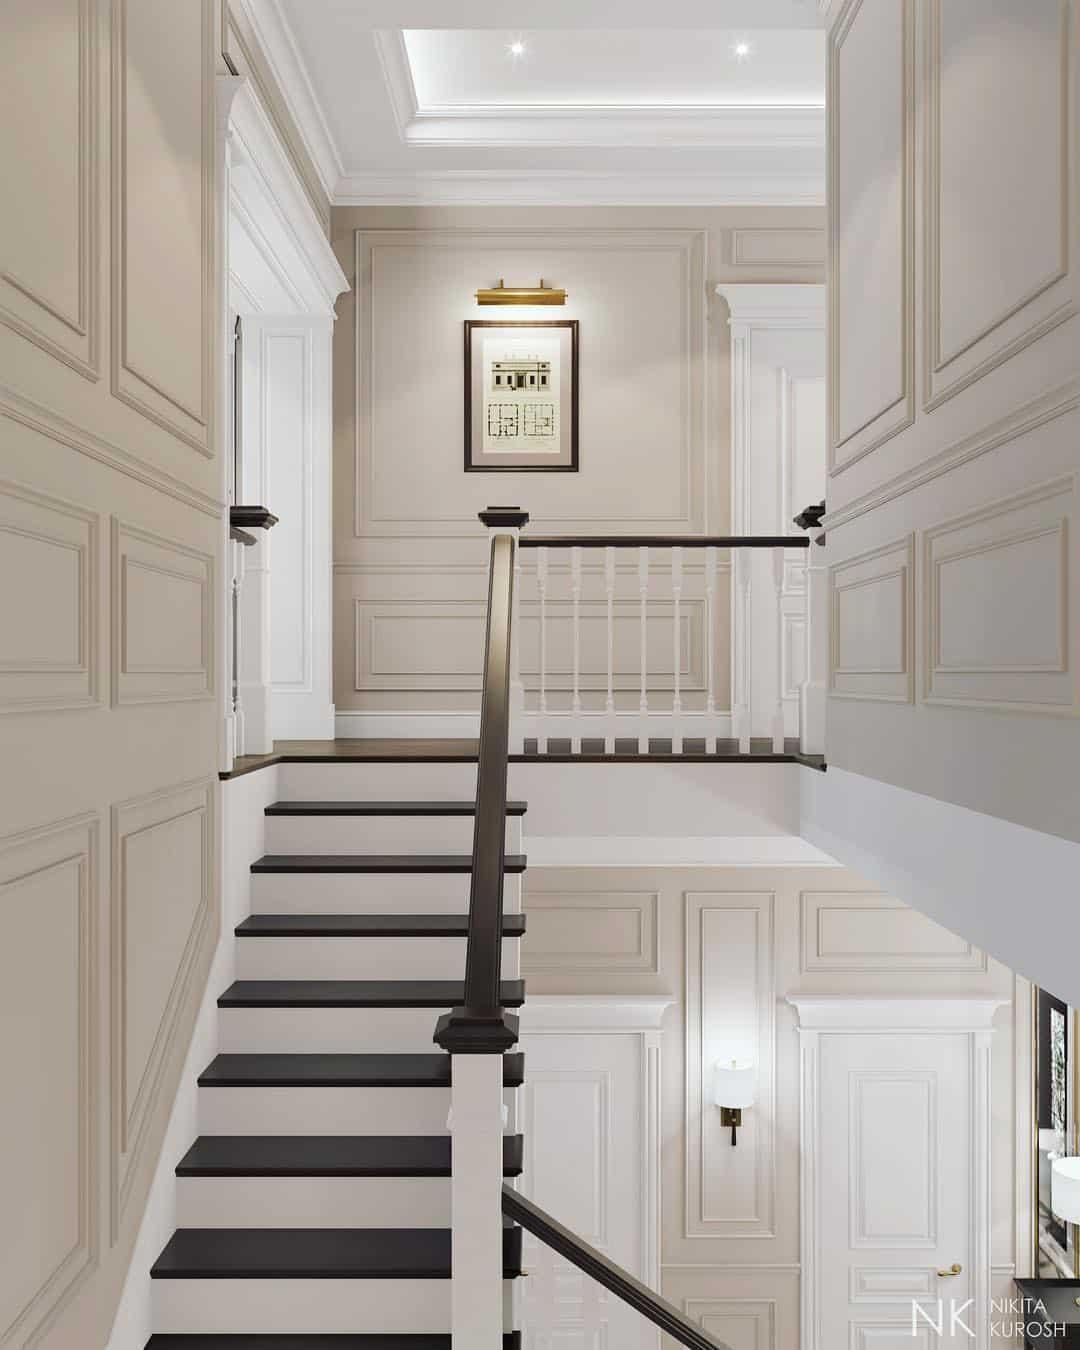 Sala de entrada: Interior actual para salas de entrada 2020